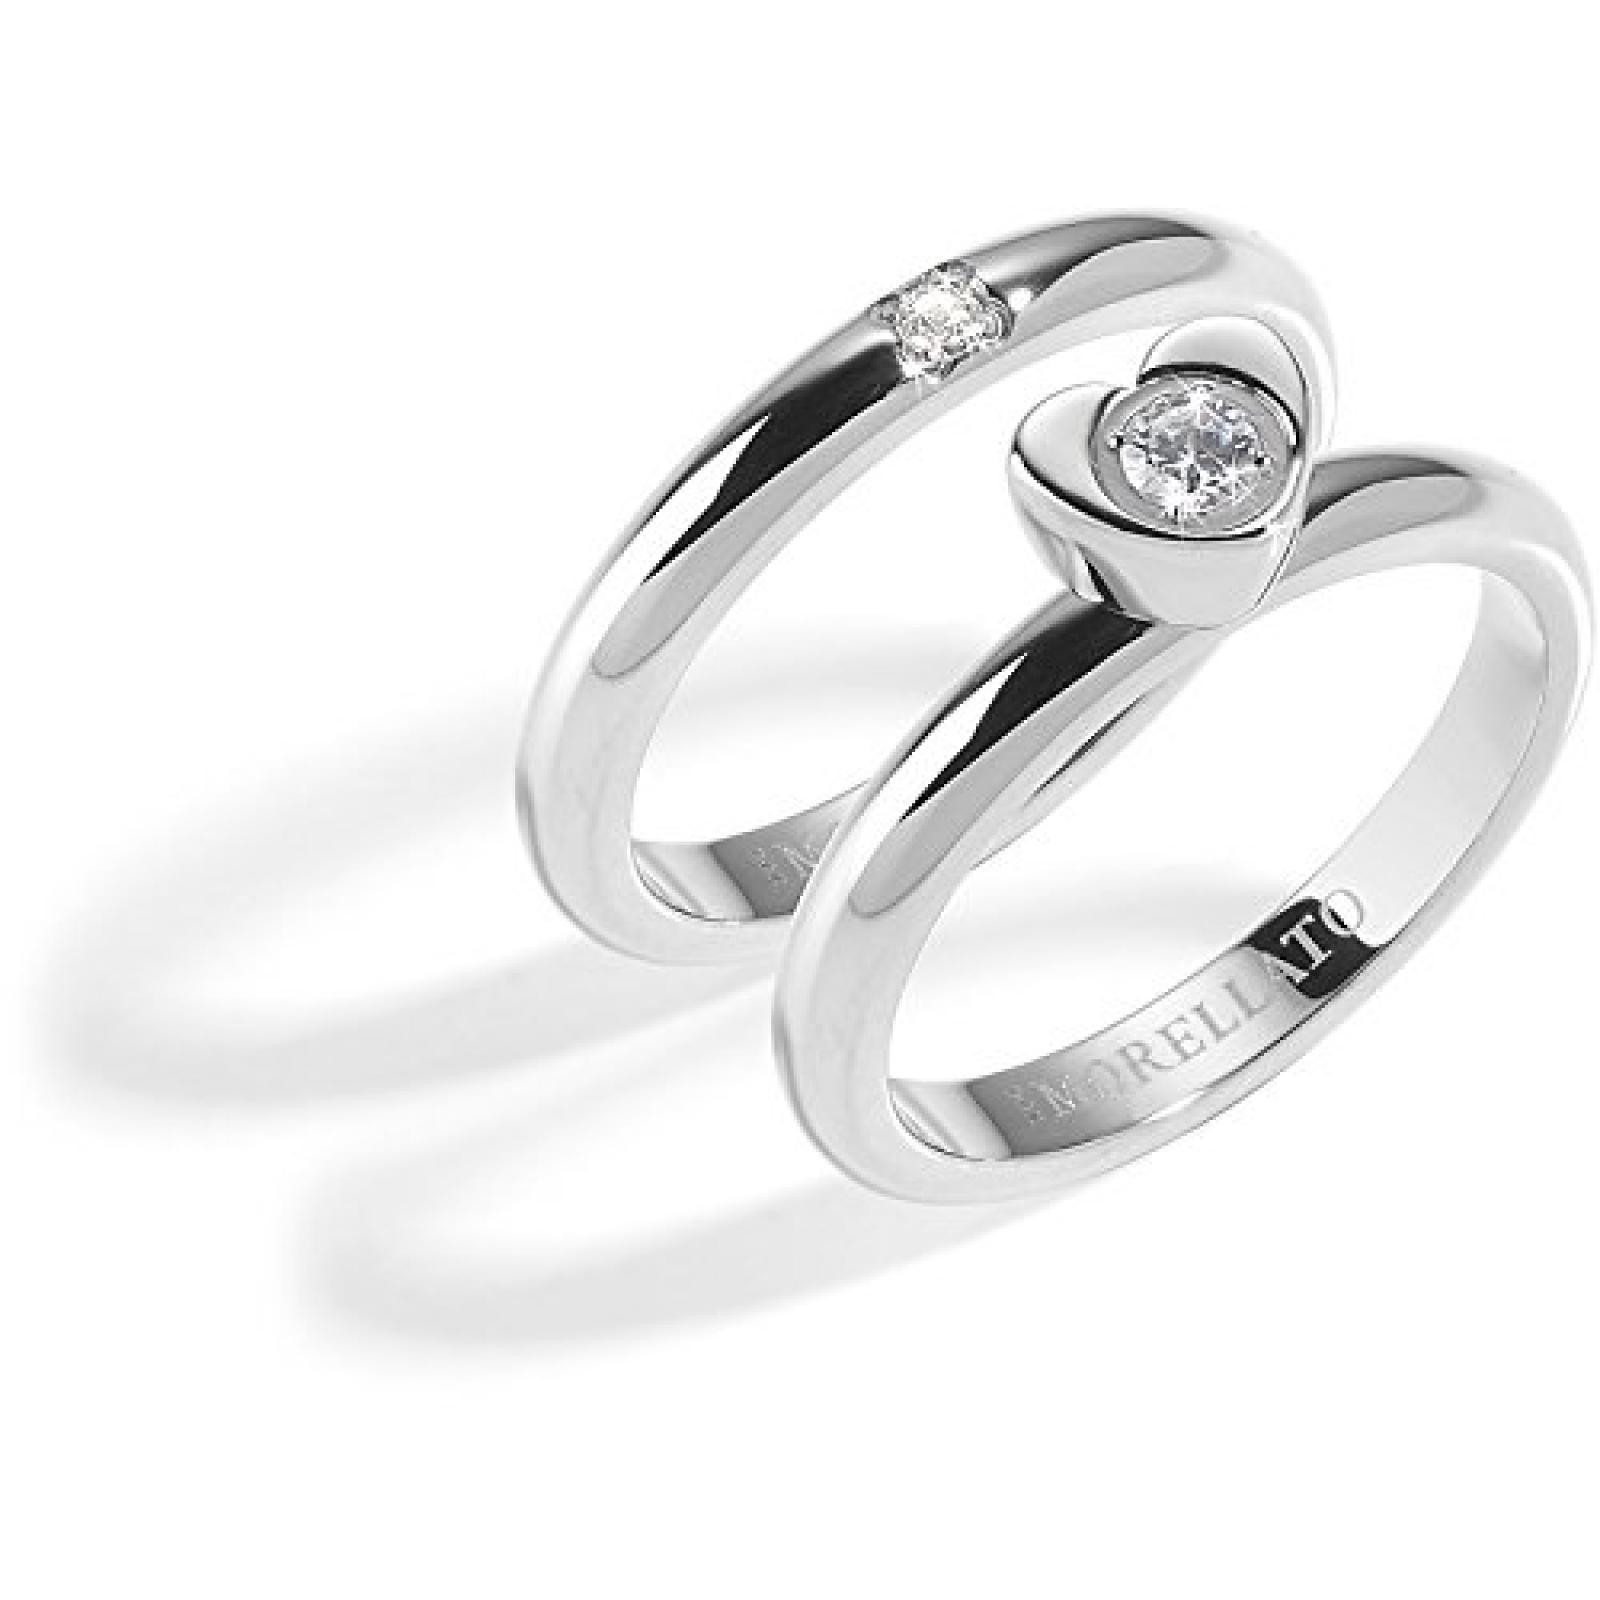 ORIGINAL MORELLATO Ring LOVE RINGS Damen - SNA35014